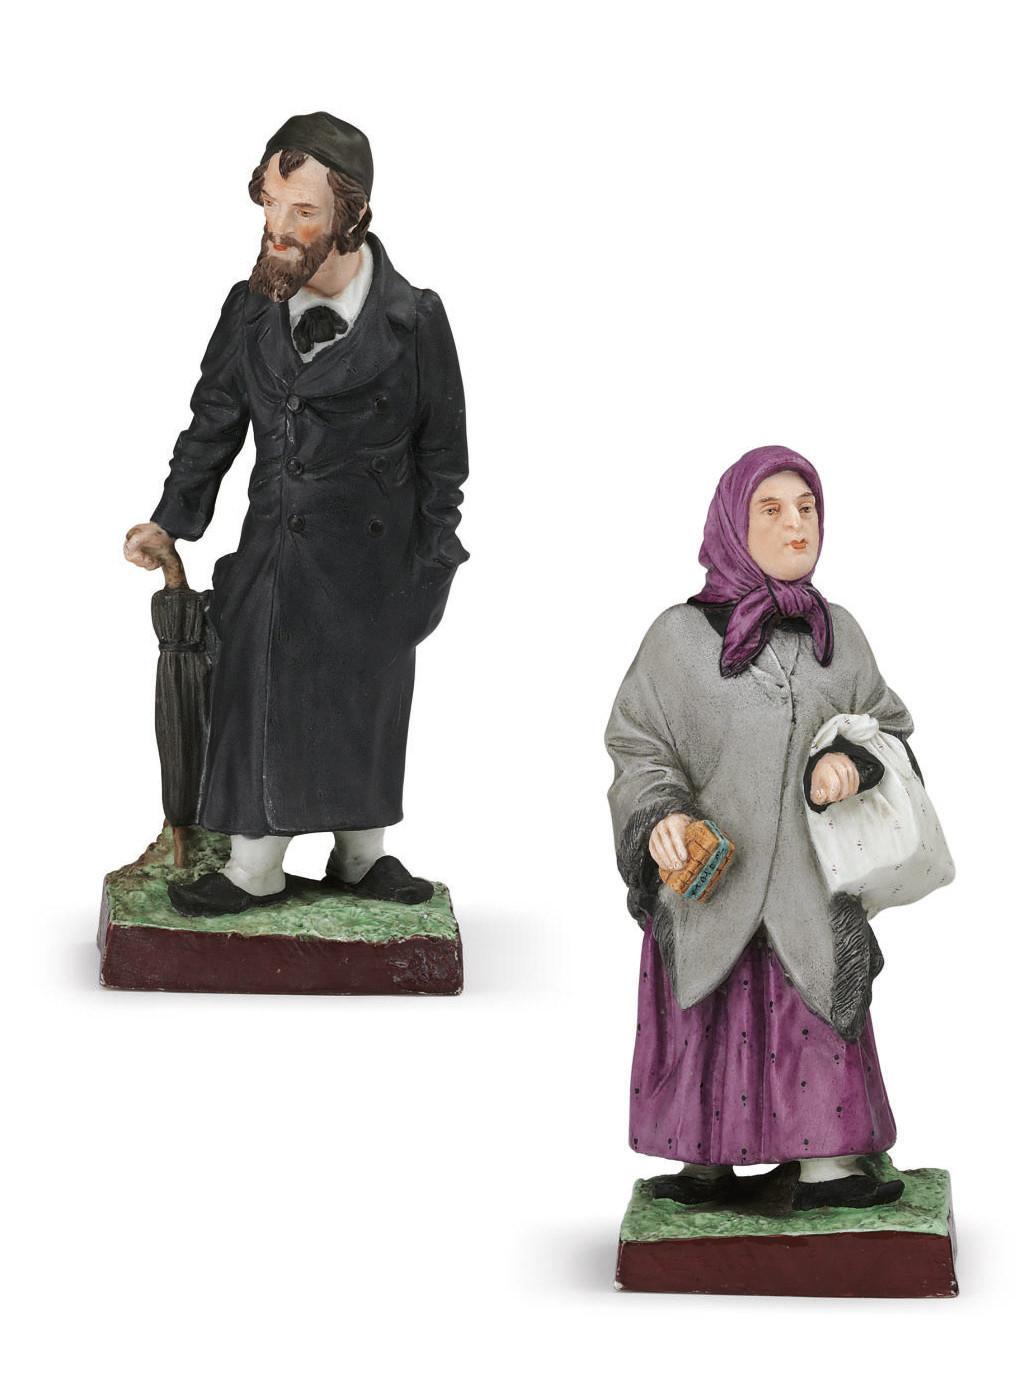 A Porcelain Figure of a Jew an